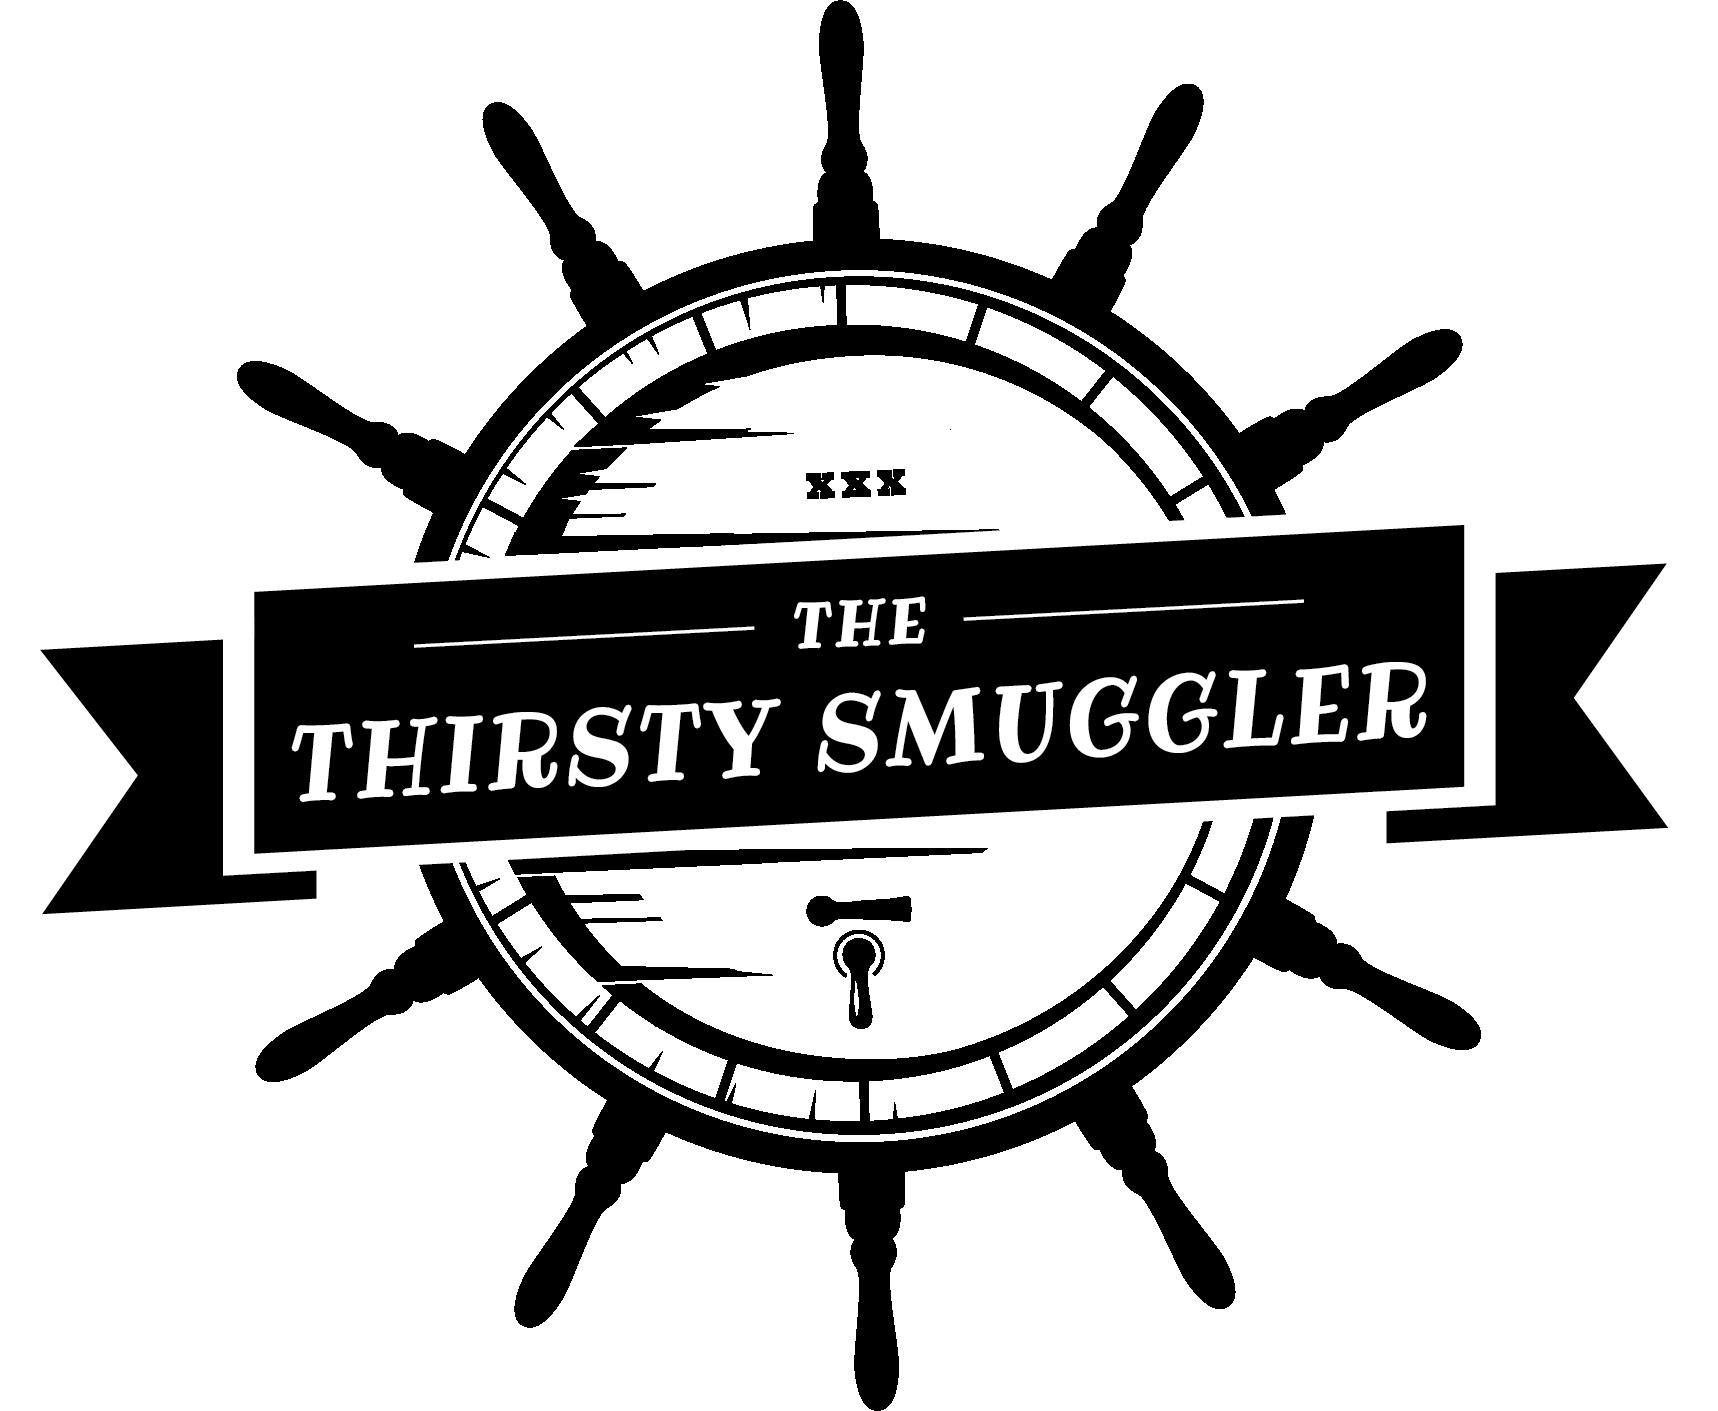 Thirsty_Smuggler